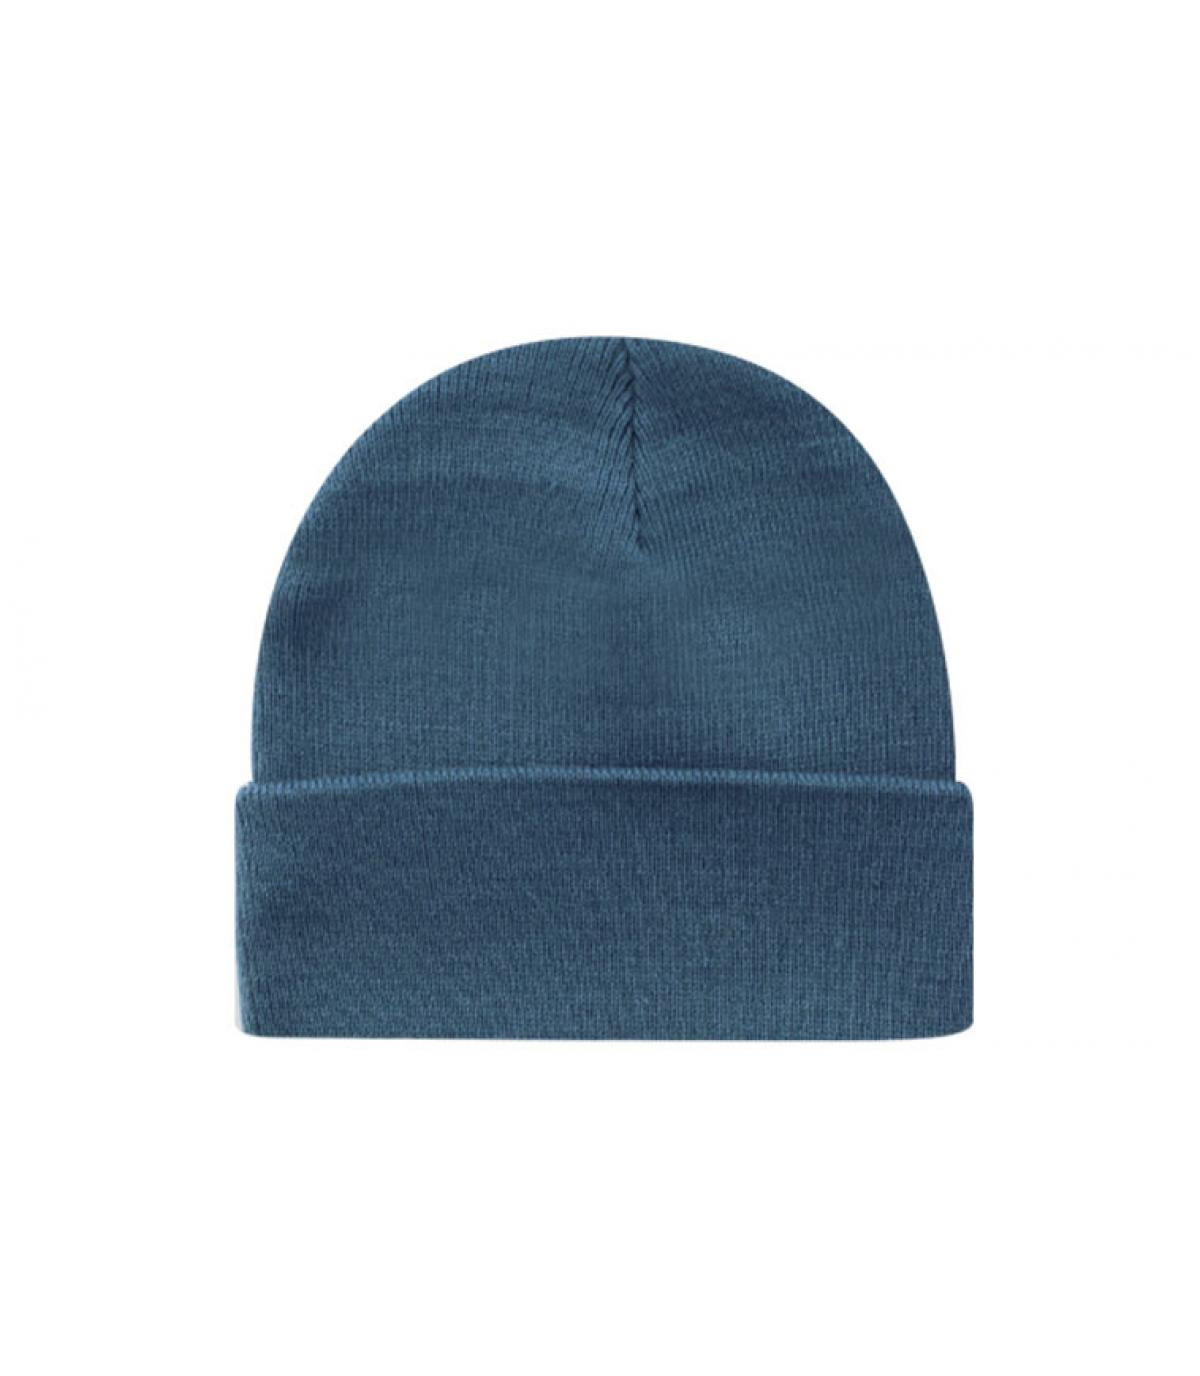 Bonnet blank air force blue